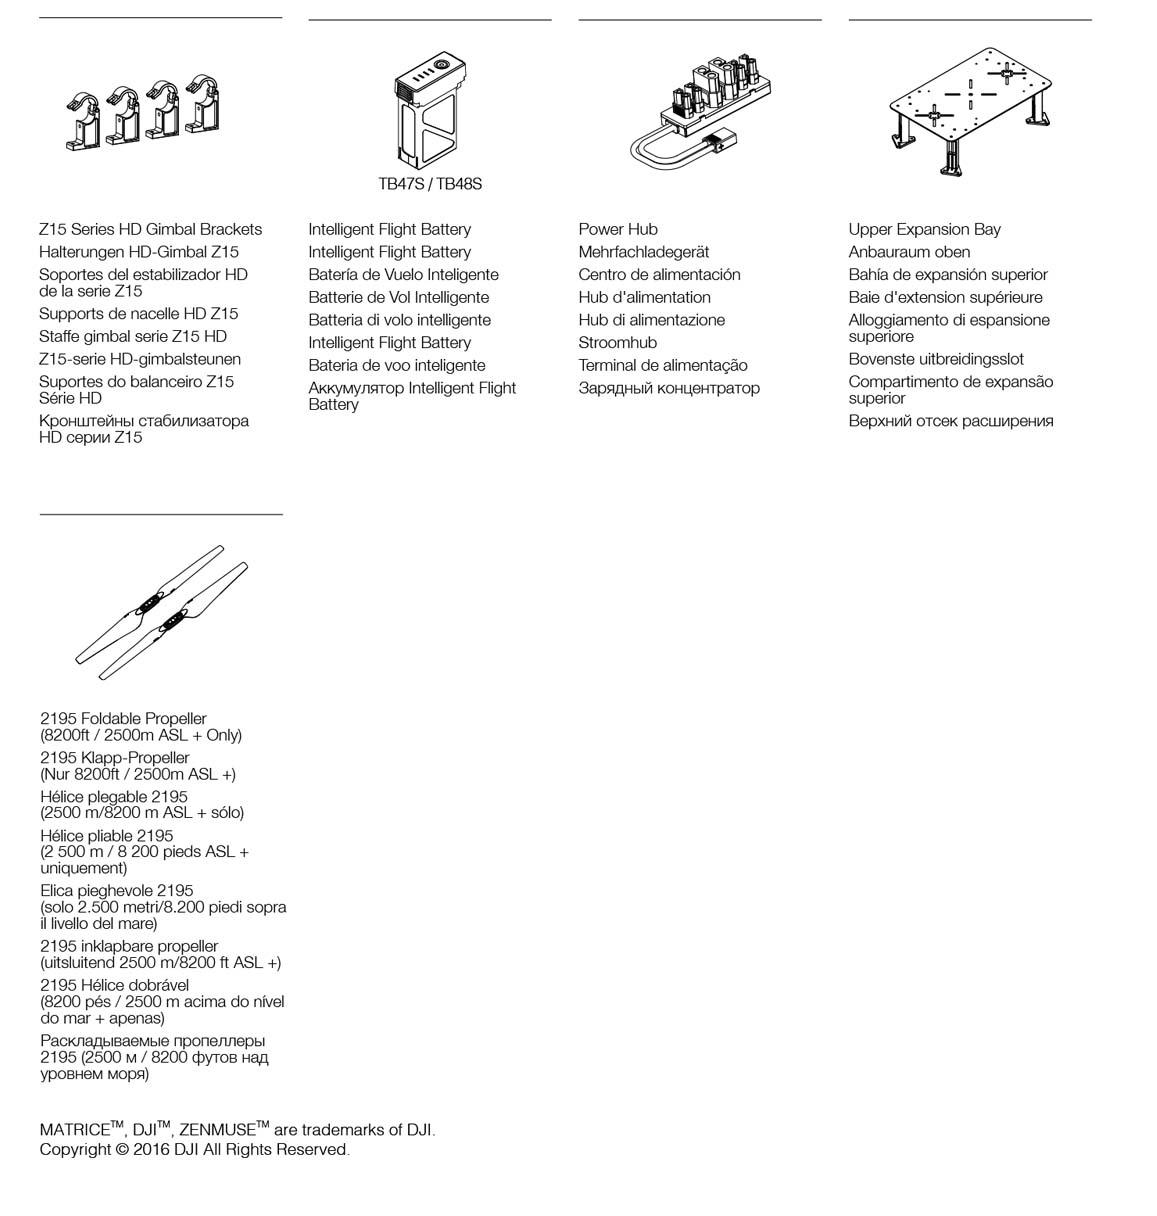 Matrice 600 pro